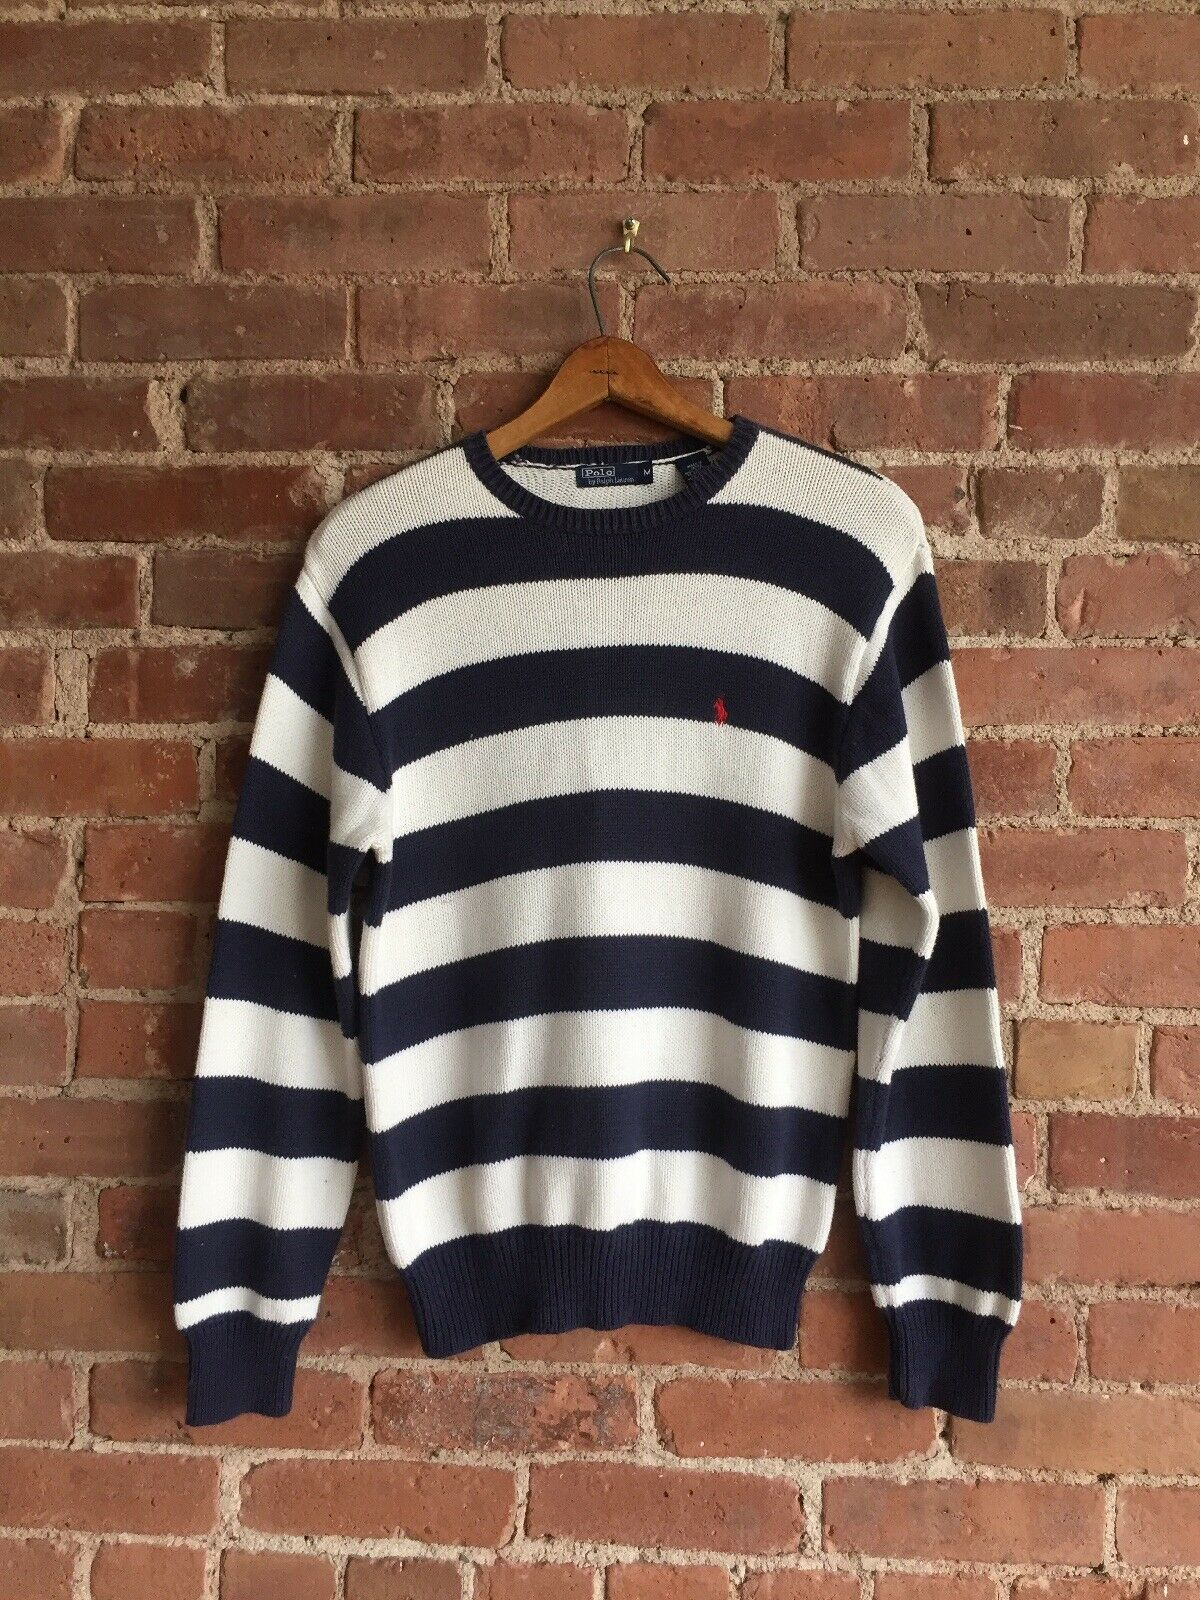 Vtg Polo Ralph Lauren Men's Sweater, Stripe 100% Cotton Sz Medium Slim, Japan